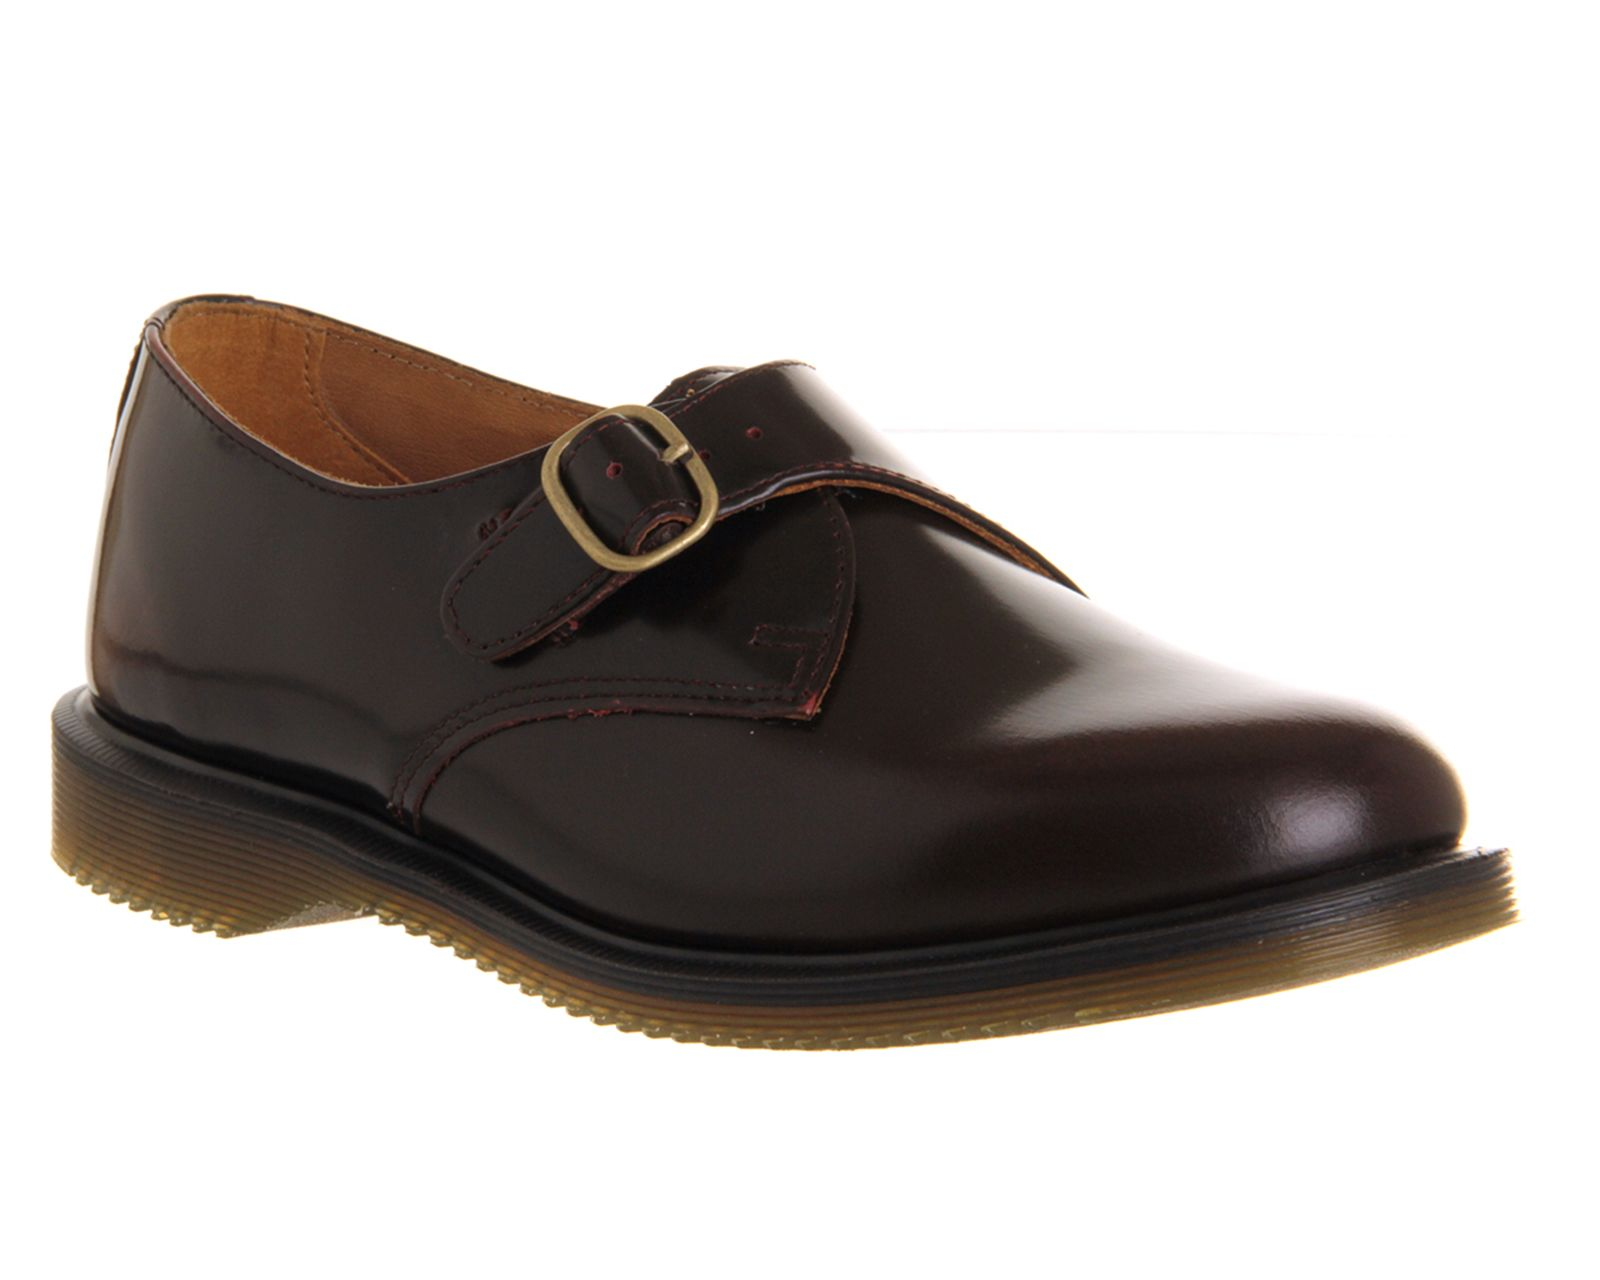 Dr. Martens Kensington Lorne Monk Shoe Cherry Red Arcadia - Flats